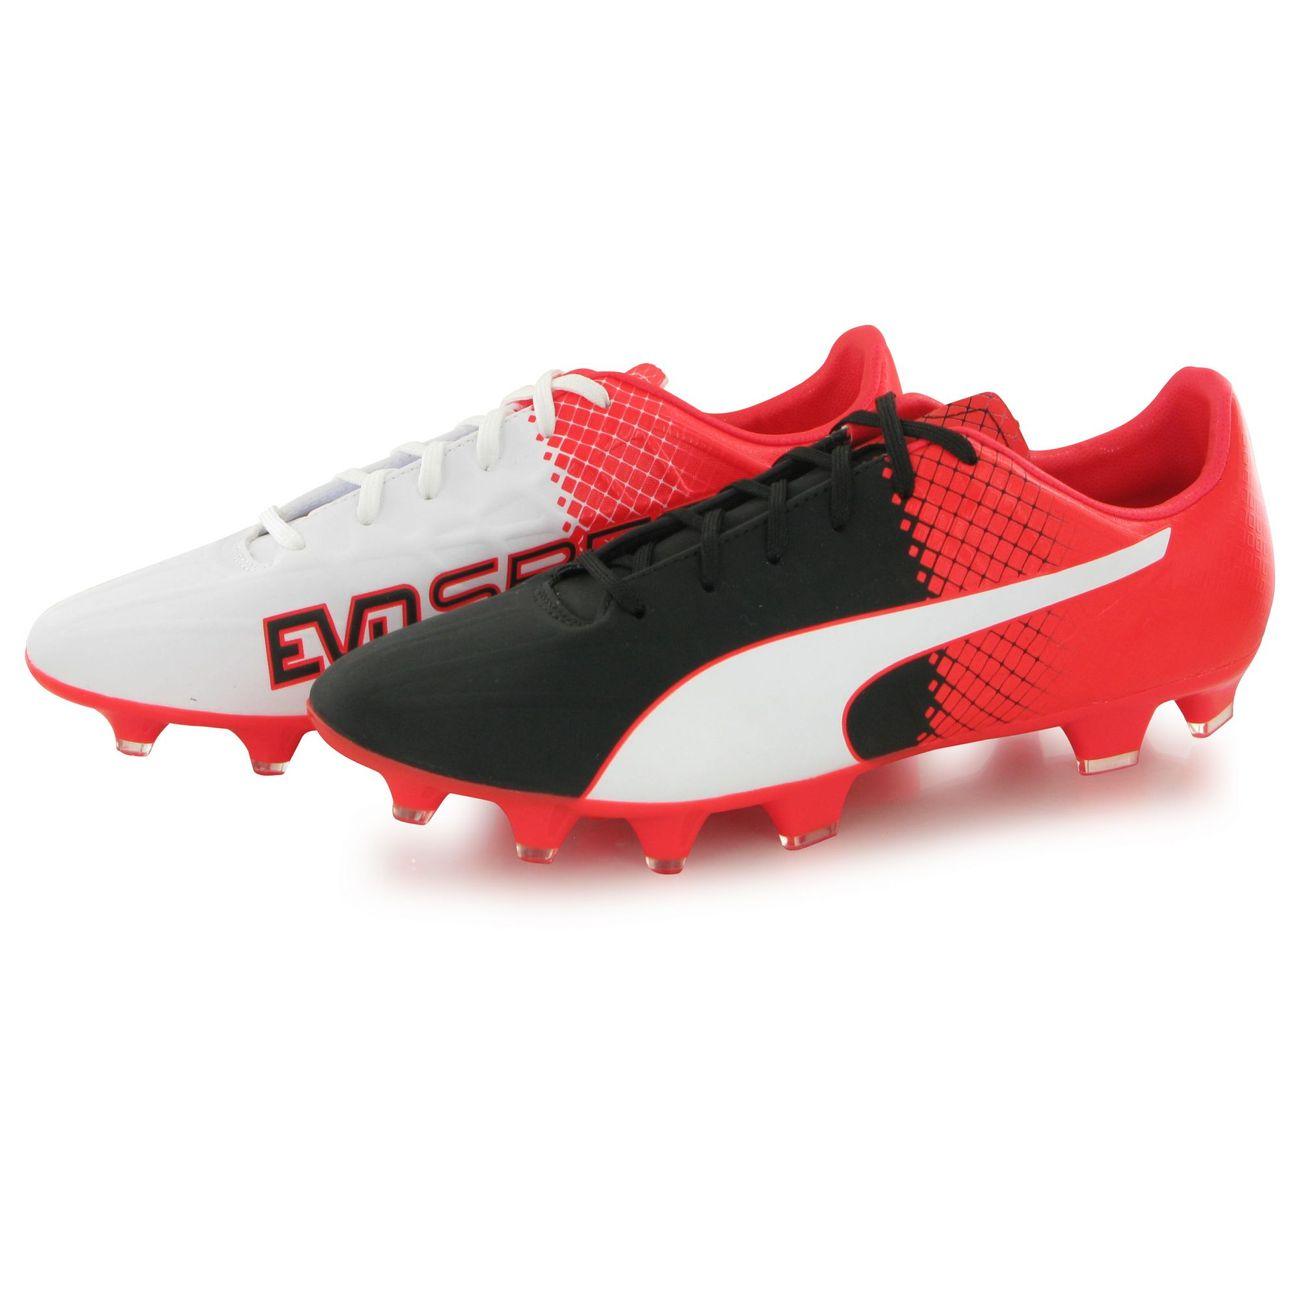 Football homme PUMA Chaussure de foot puma Puma Evospeed 4.5 FG